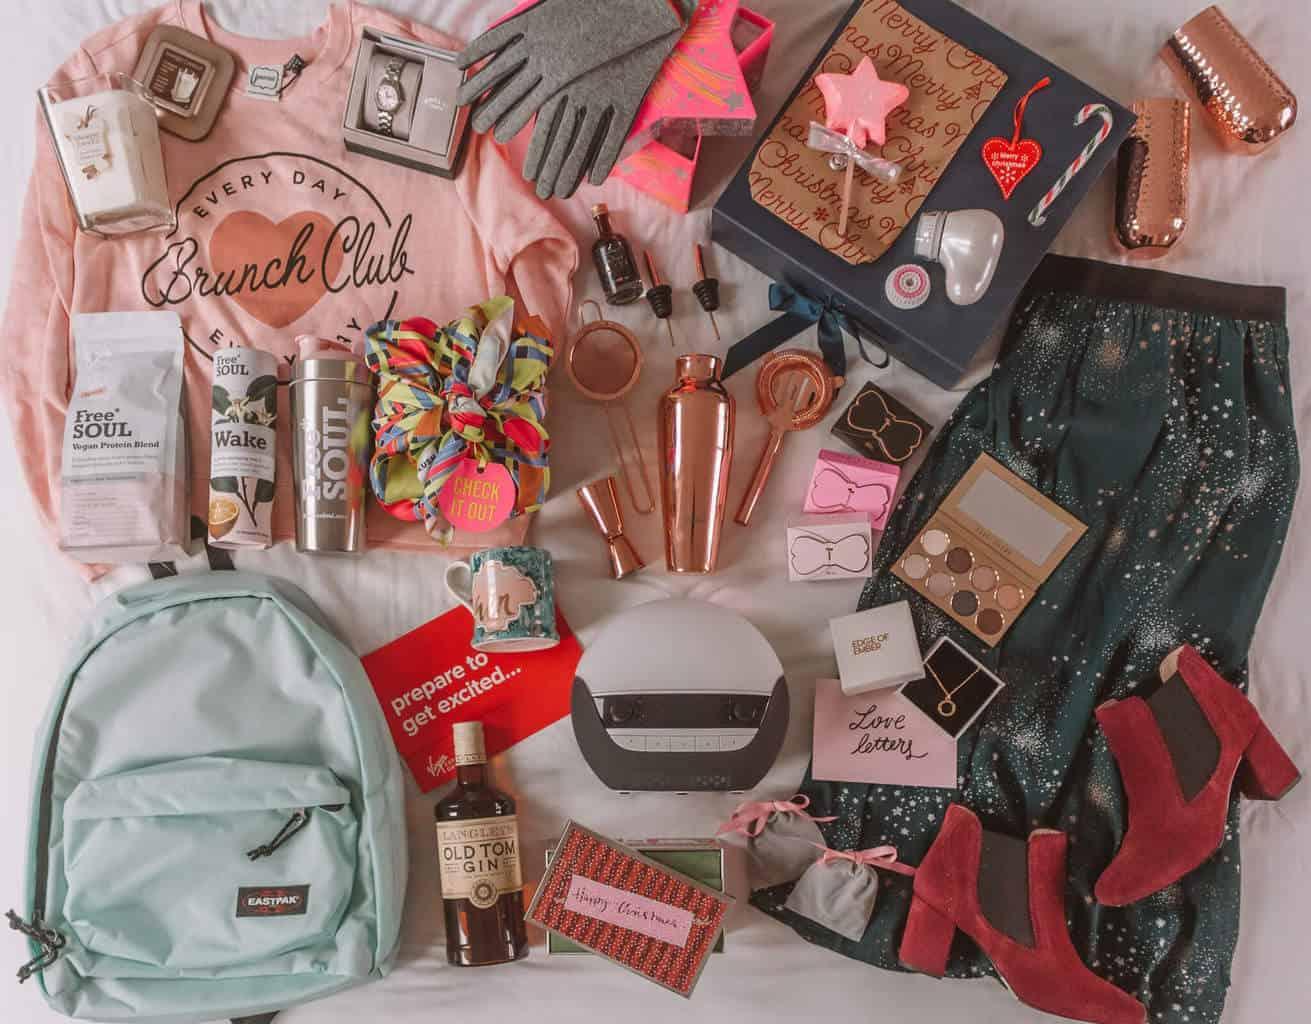 Christmas Gift Guide 2018: Brilliant Christmas Gift Ideas For Her #whatshotblog